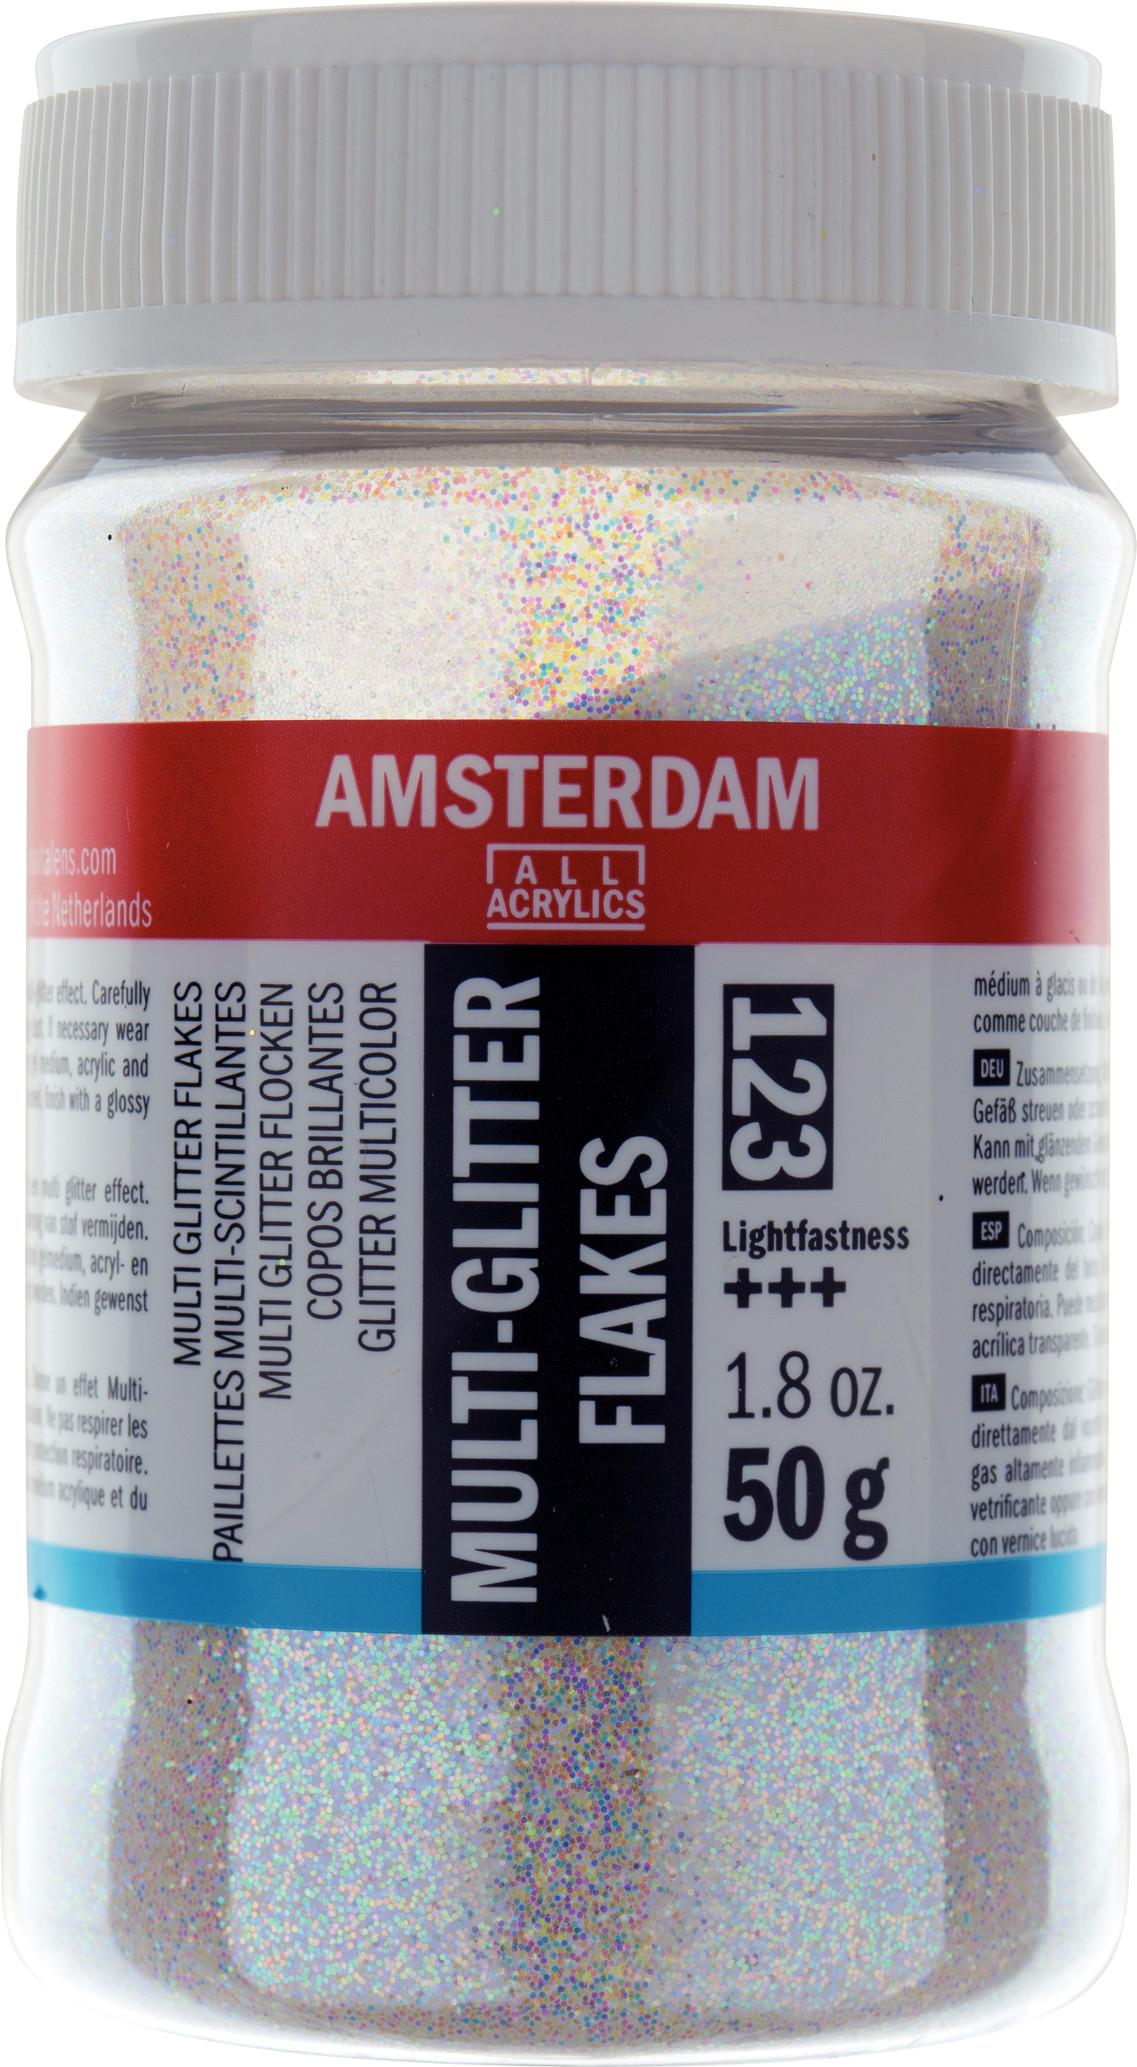 Amsterdam Multi-Colored Glitter Flakes Jar 50 g